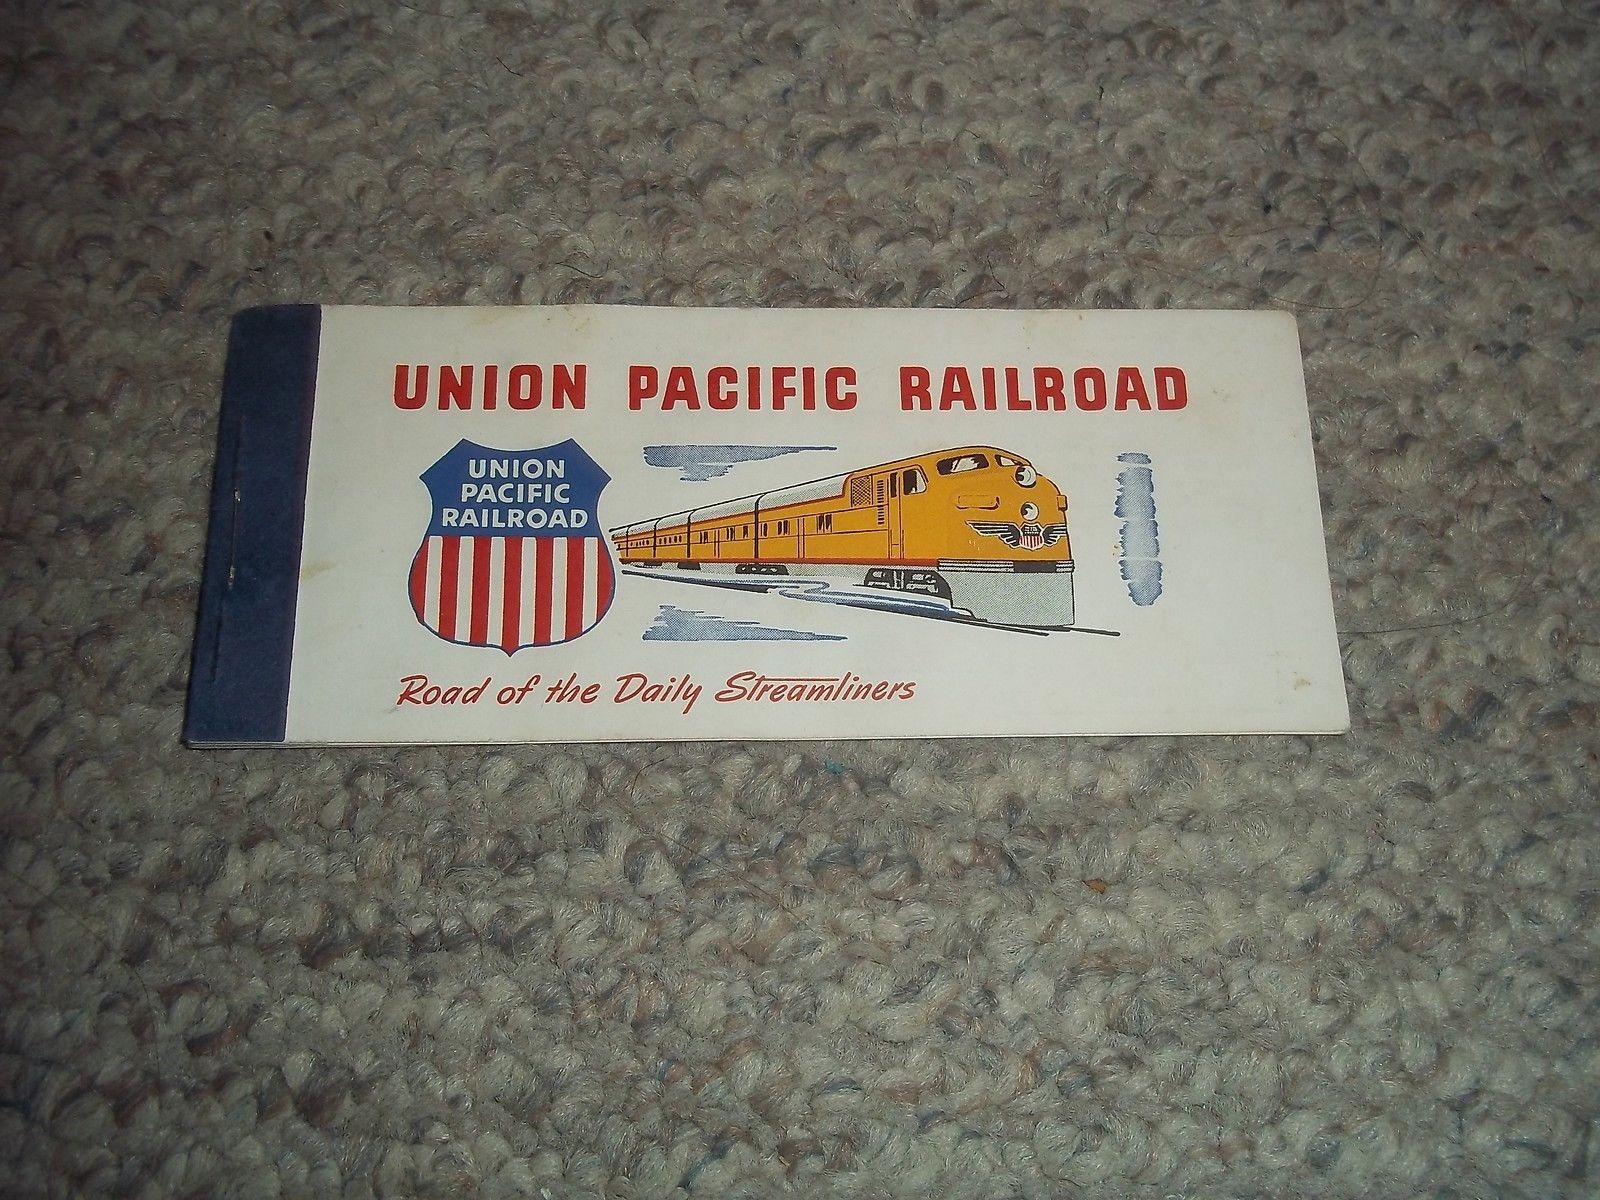 VINTAGE UNION PACIFIC RAILROAD 1954 PASSENGER COUPON TICKET BOOK $5.00.jpg